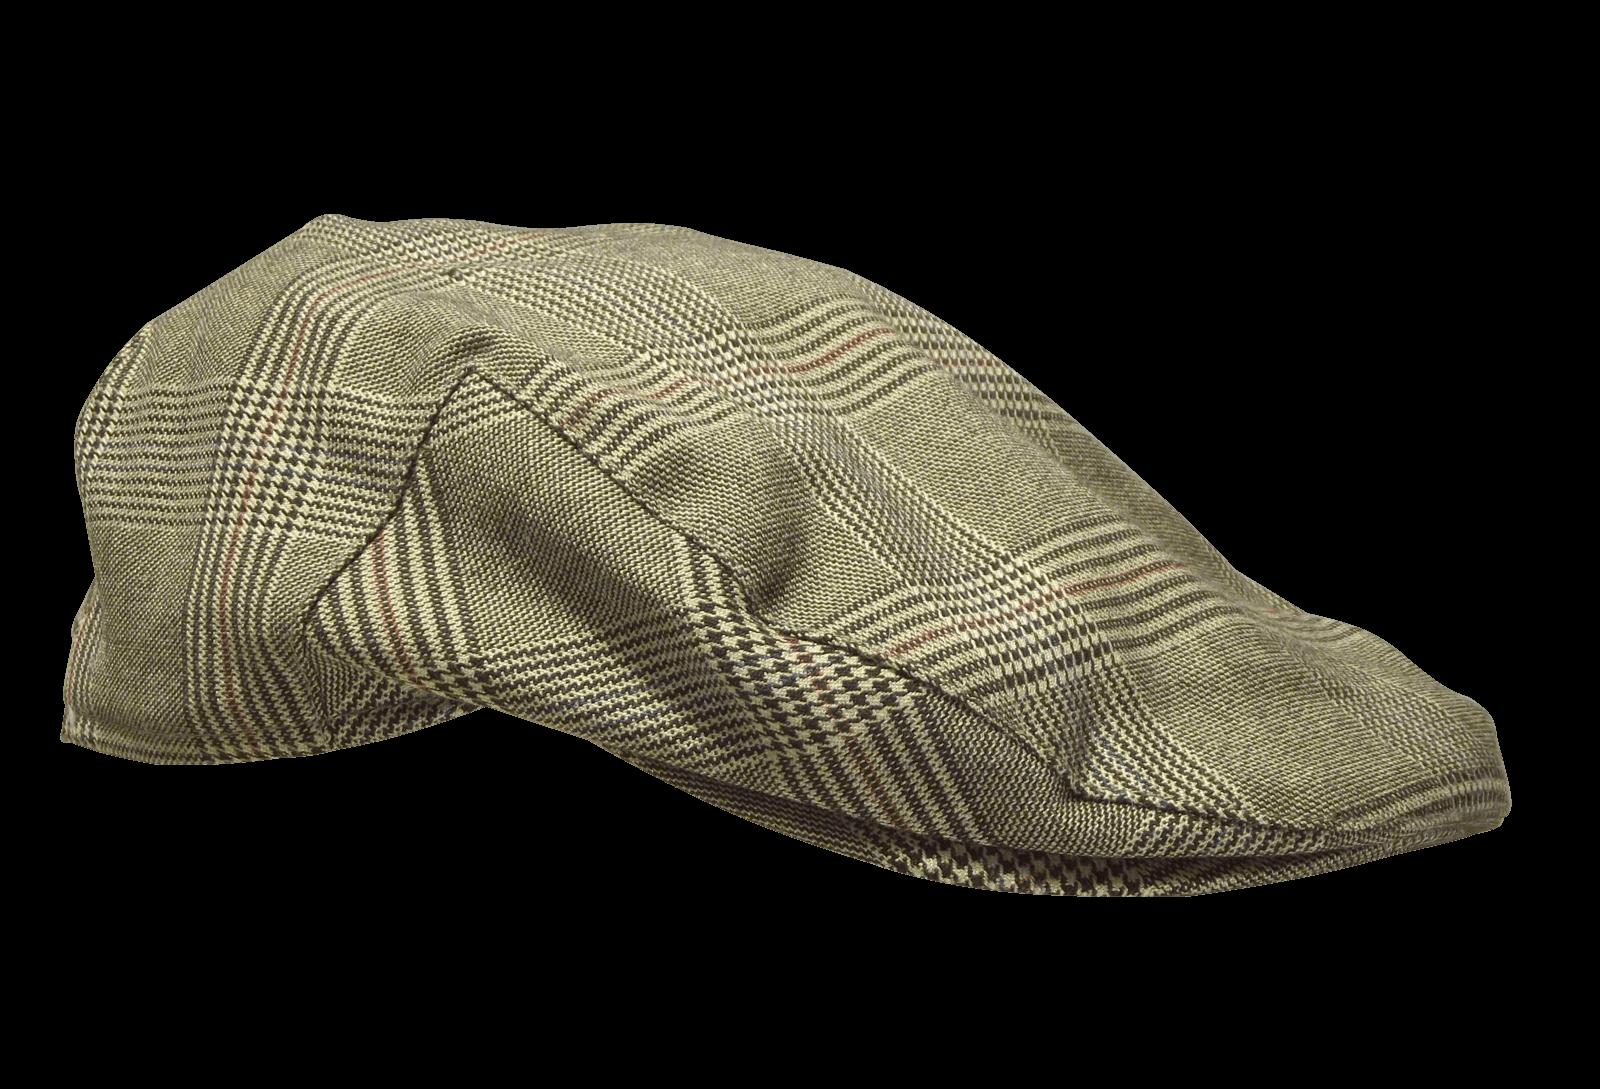 Sikh Turban PNG - 19559